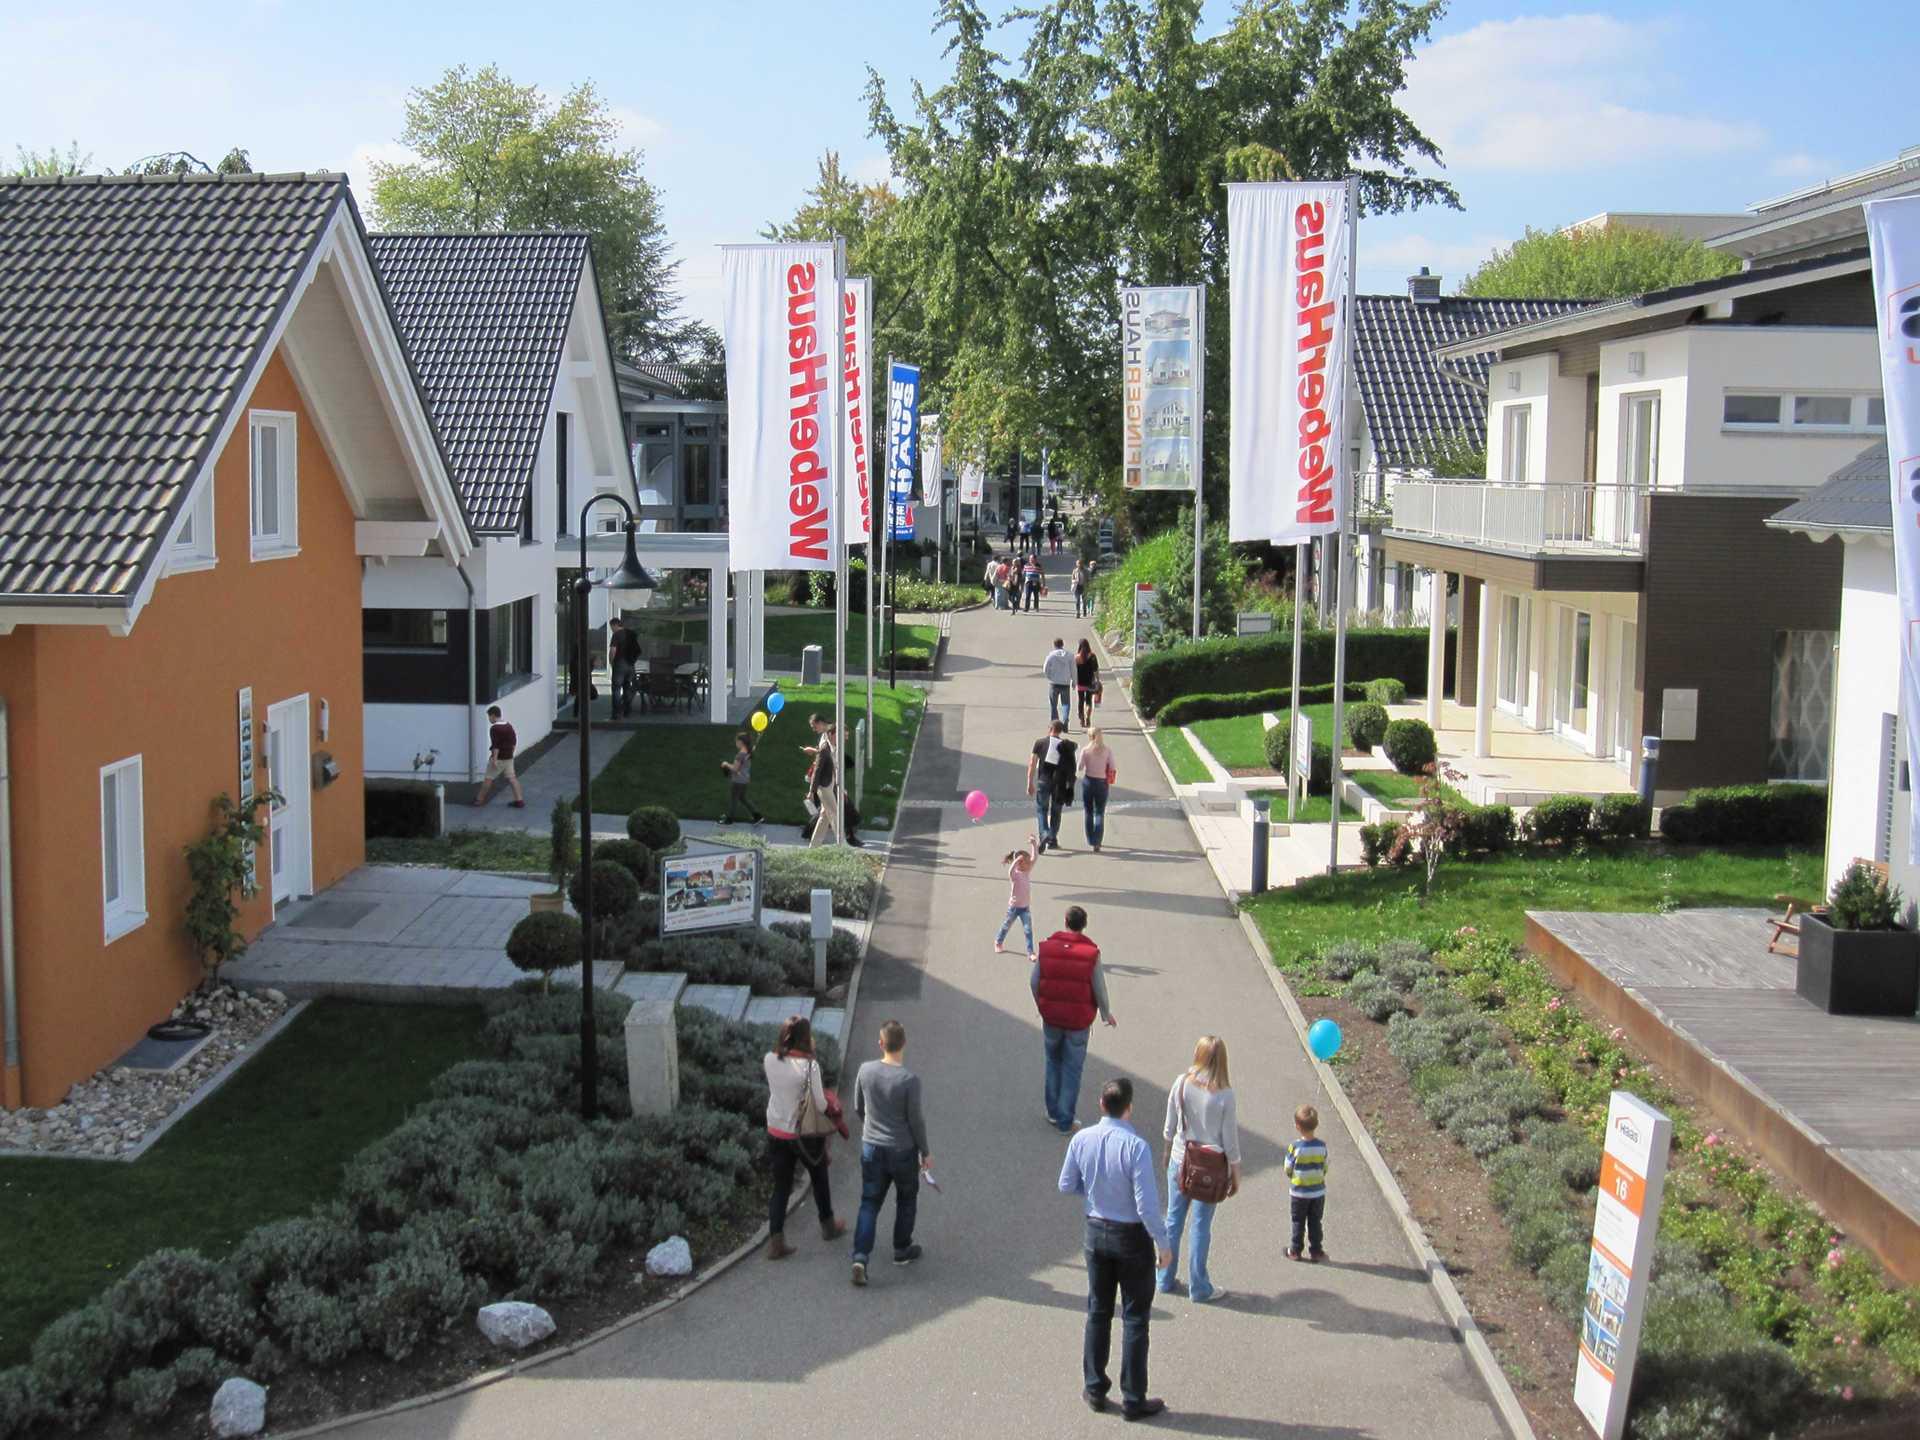 Baufirmen In Bremen Musterhausausstellung Musterhauspark Fellbach